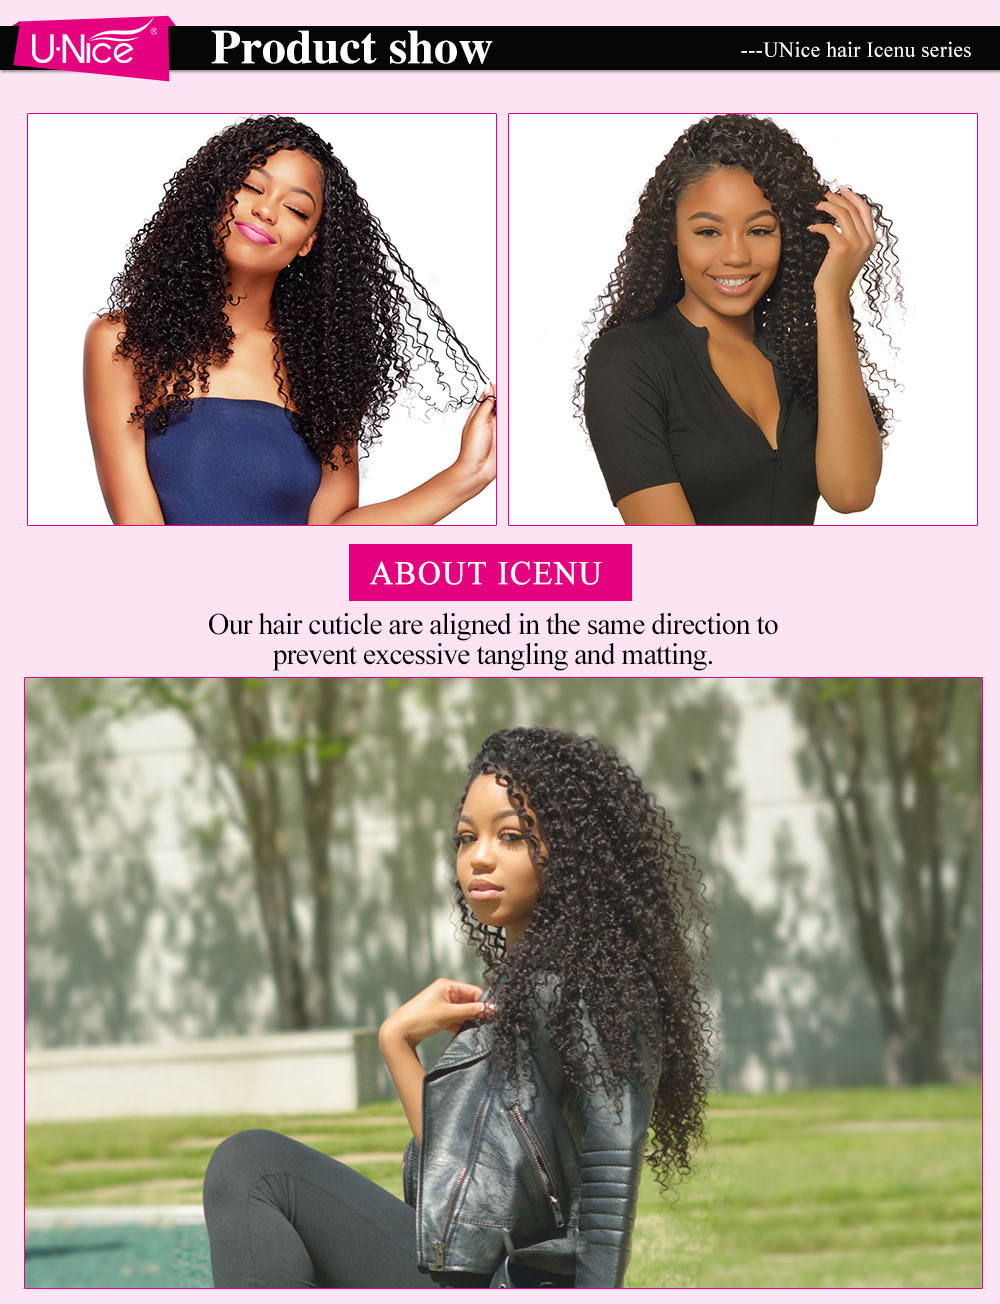 UNice hair icenu series Jerry Curly Hair customer show